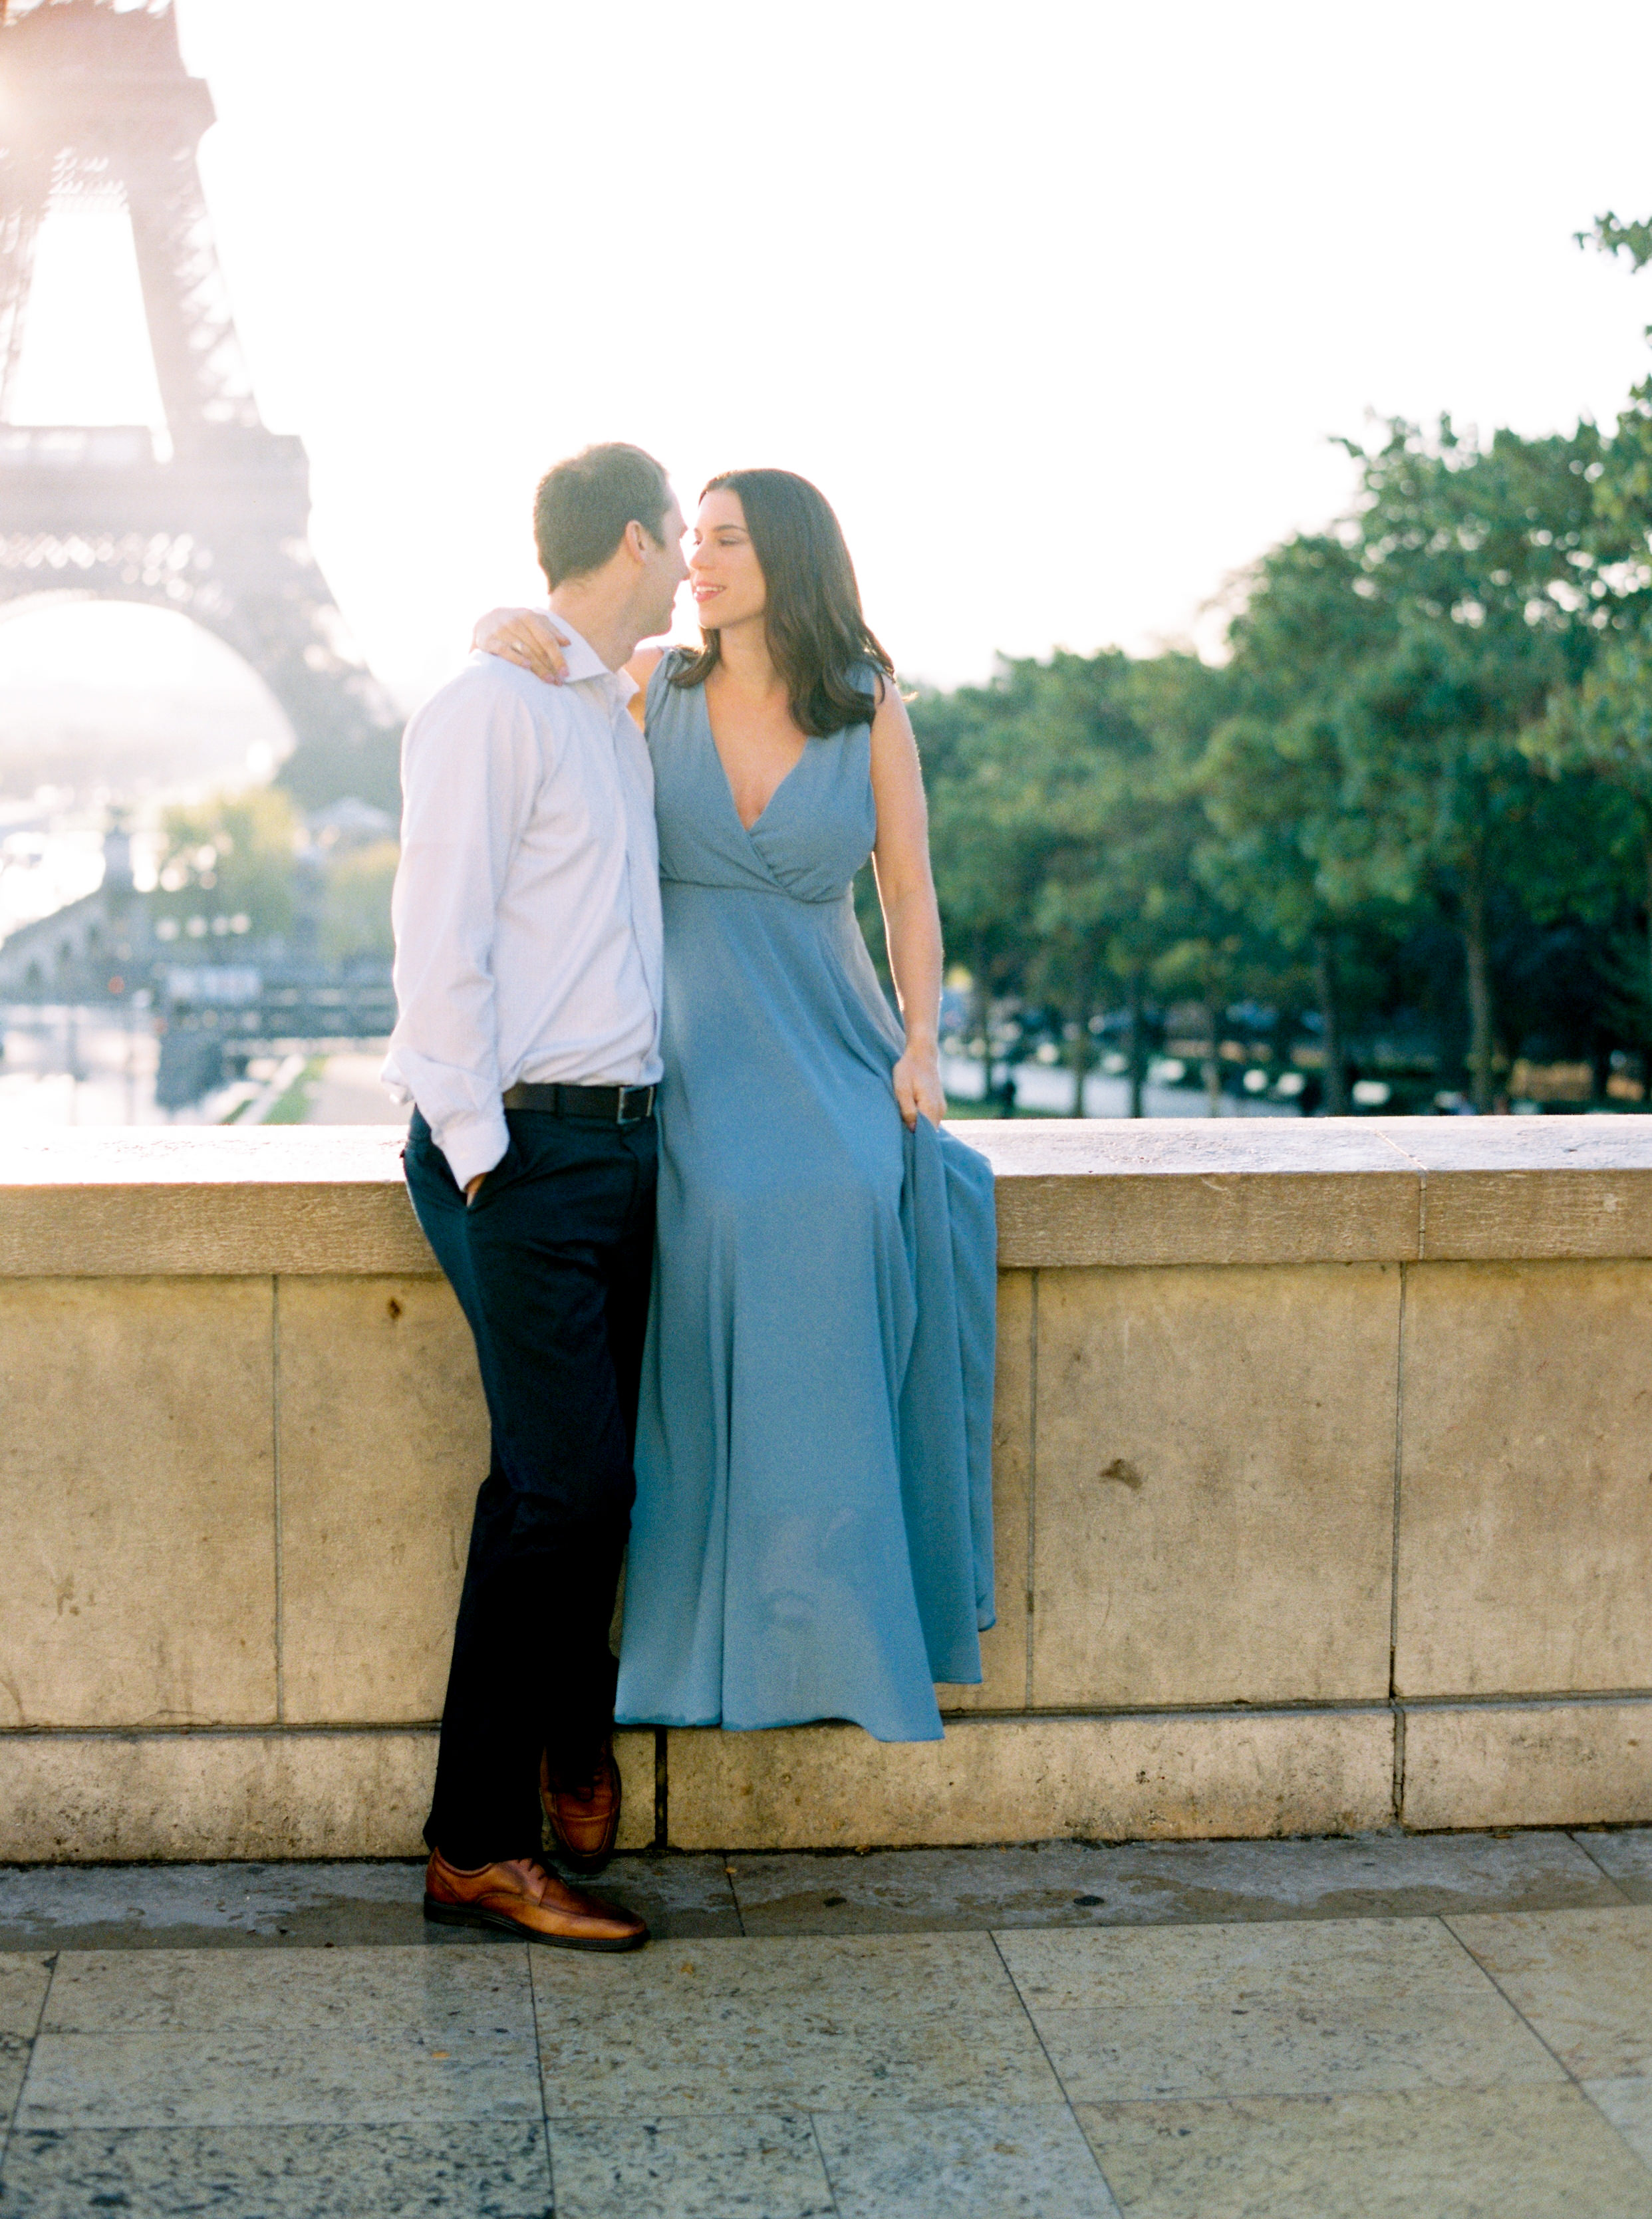 paris-france-wedding-photographer-destination-photographer-56.jpg